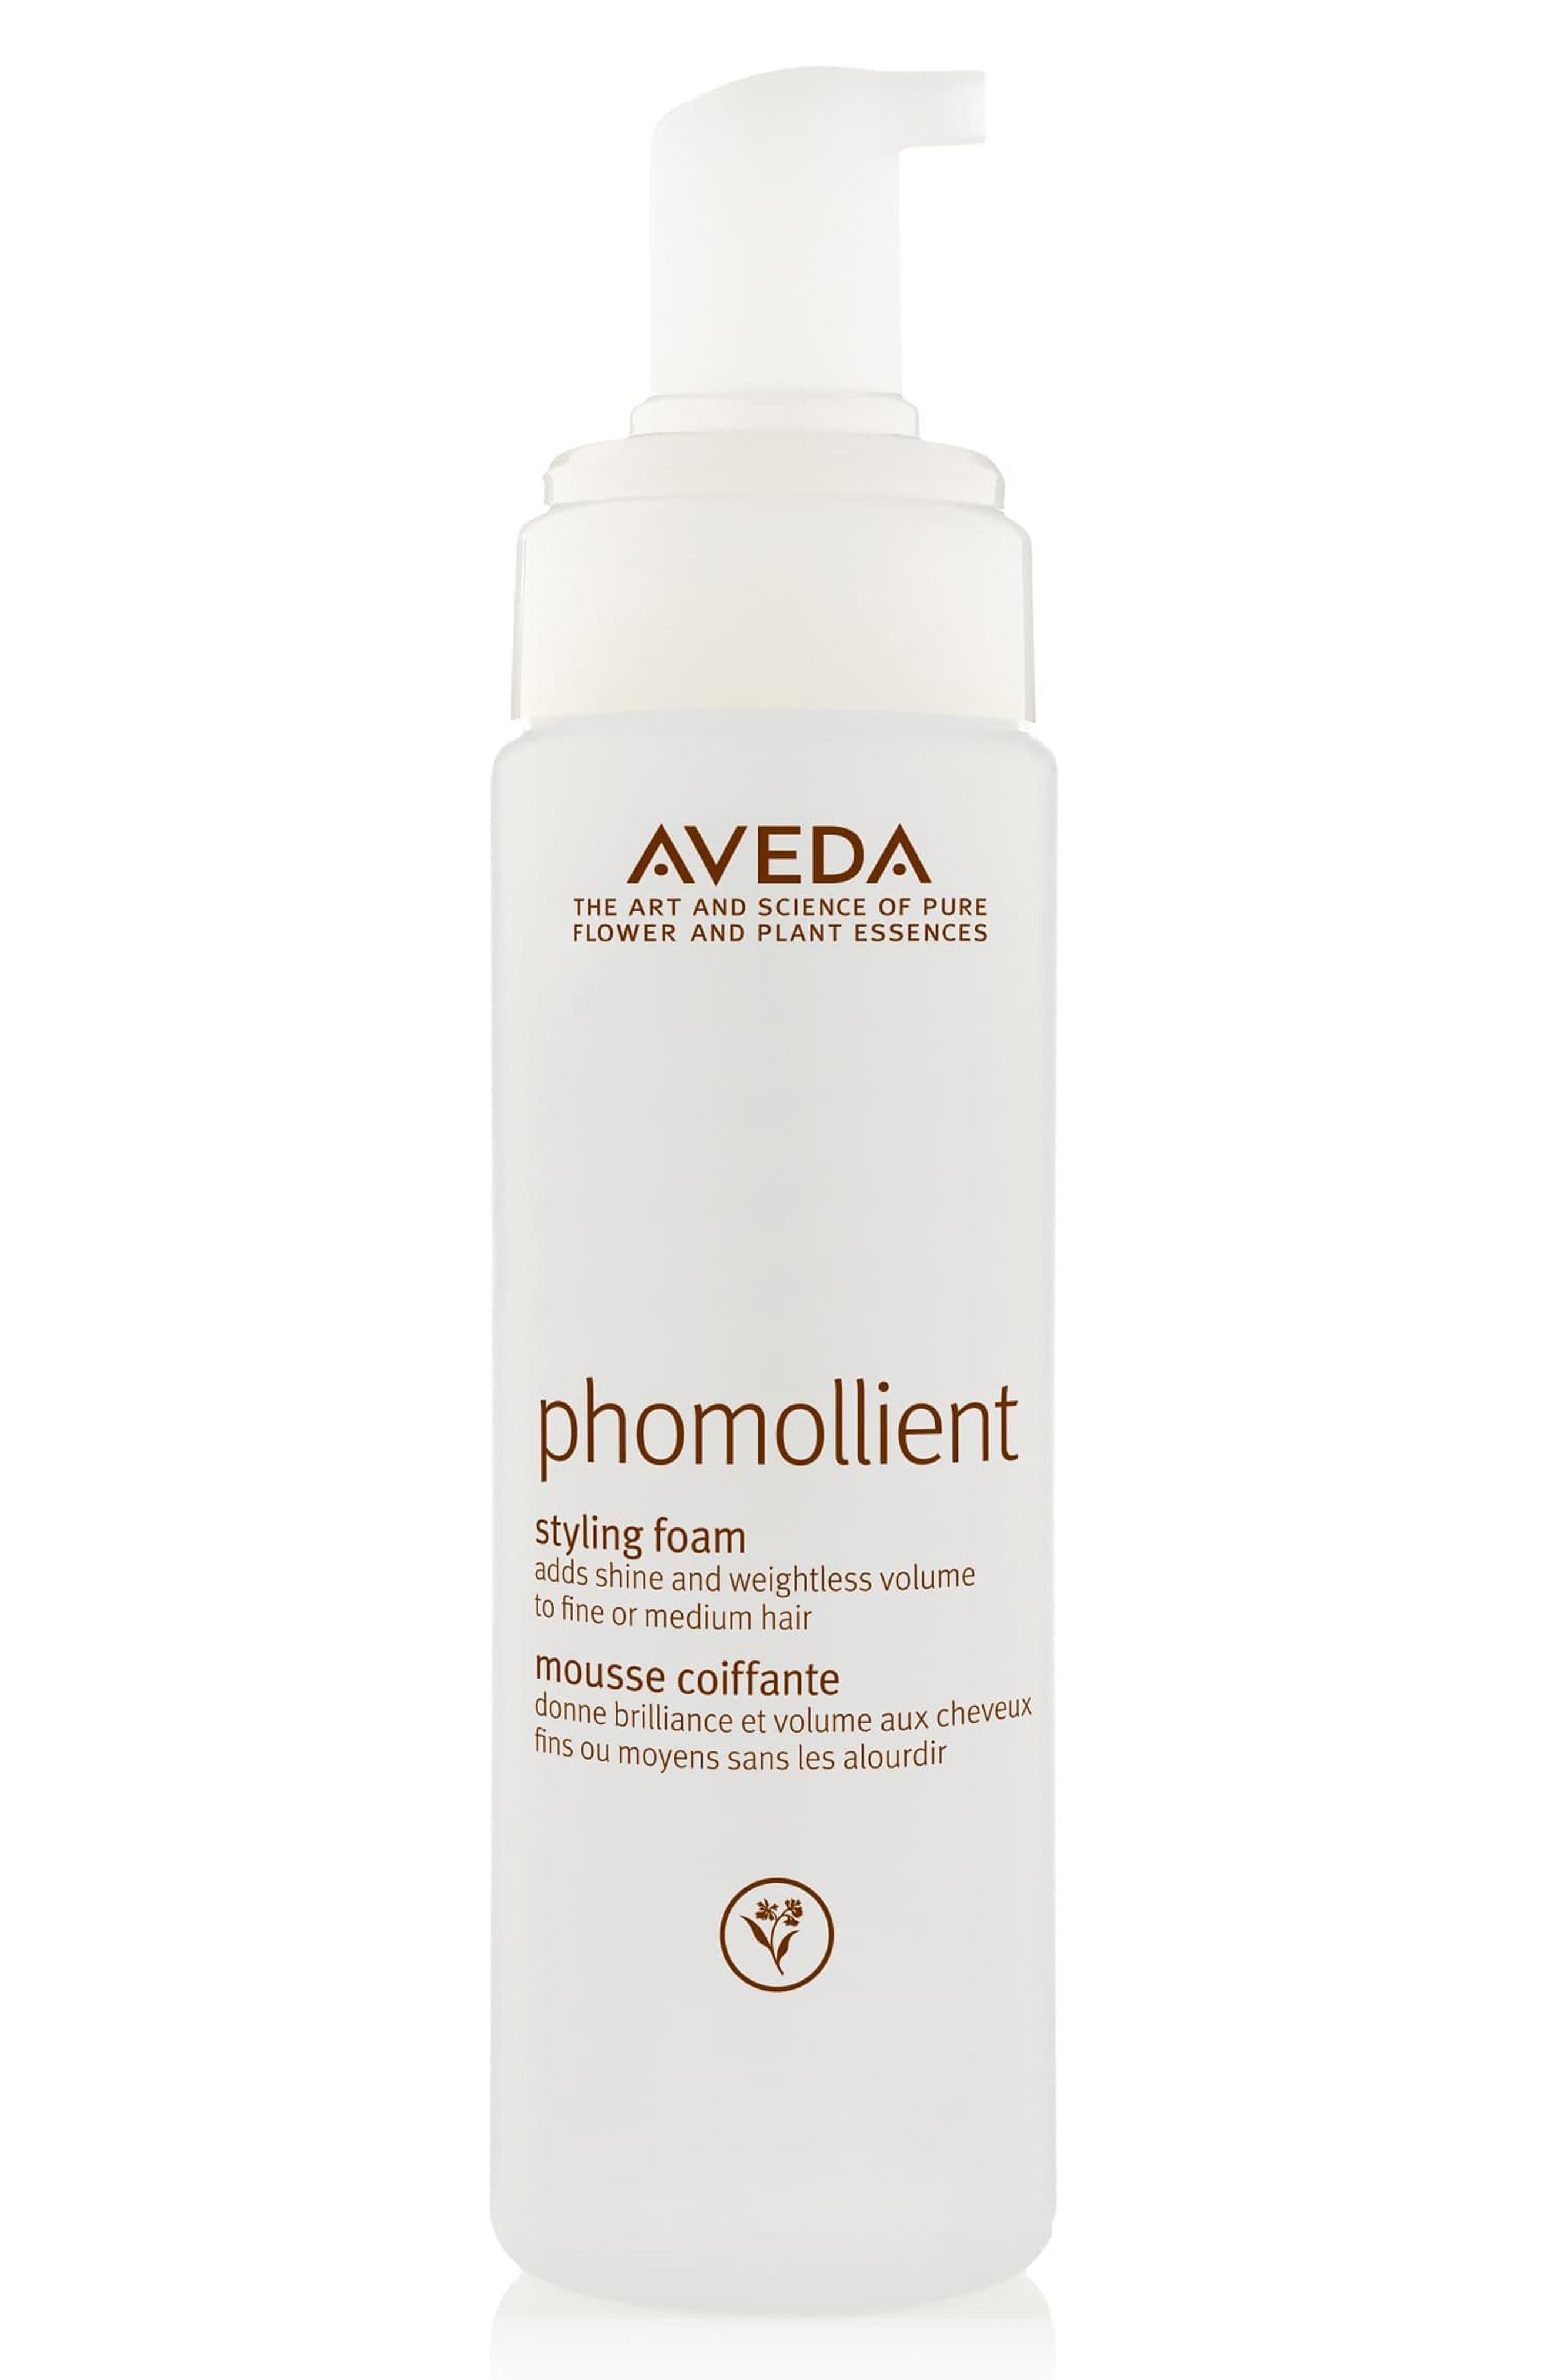 Alternate Image 1 Selected - Aveda 'phomollient™' Styling Foam